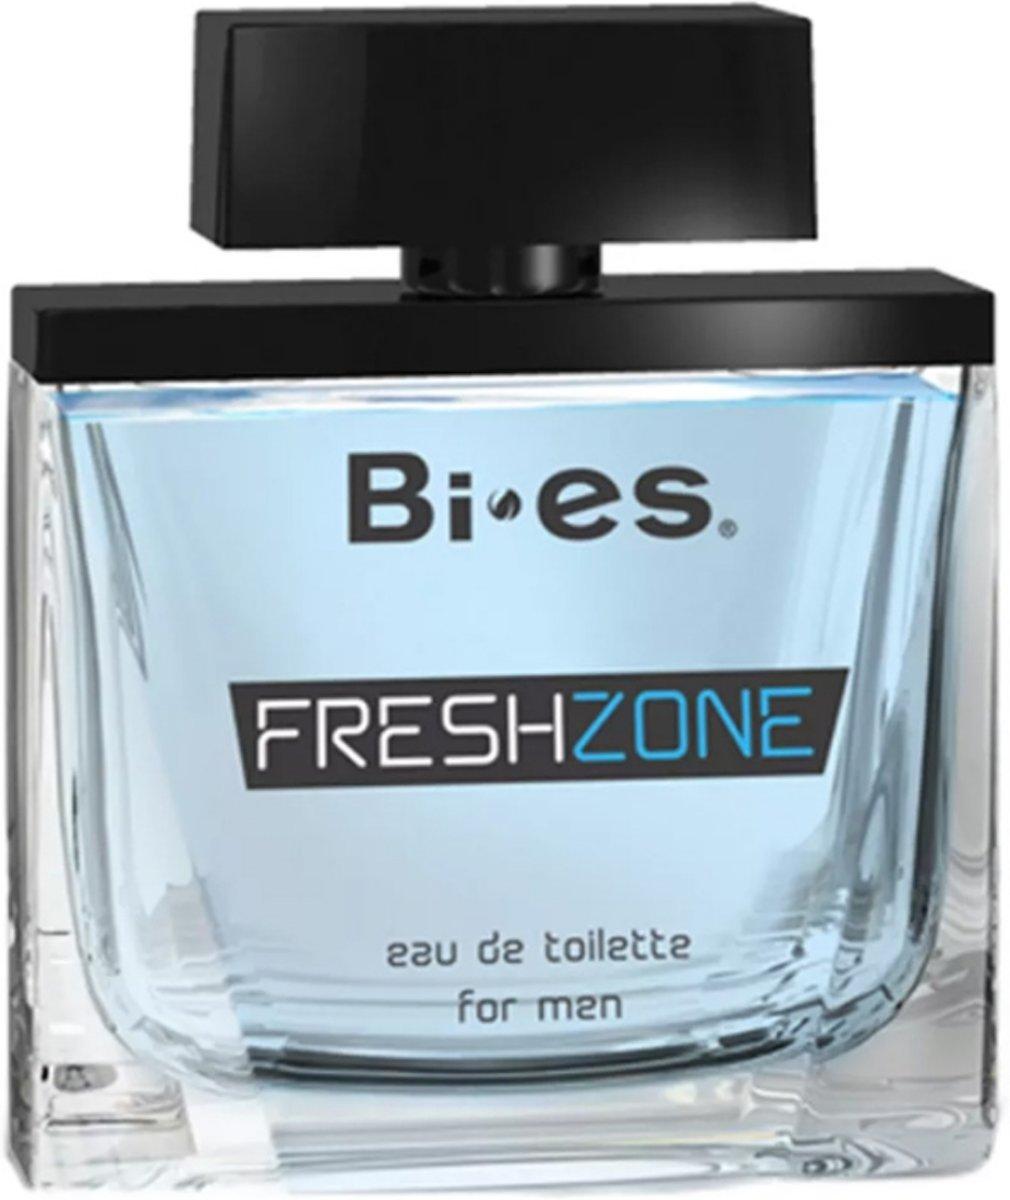 Foto van Bi.es Fresh Zone Eau de Toilette Spray 100 ml